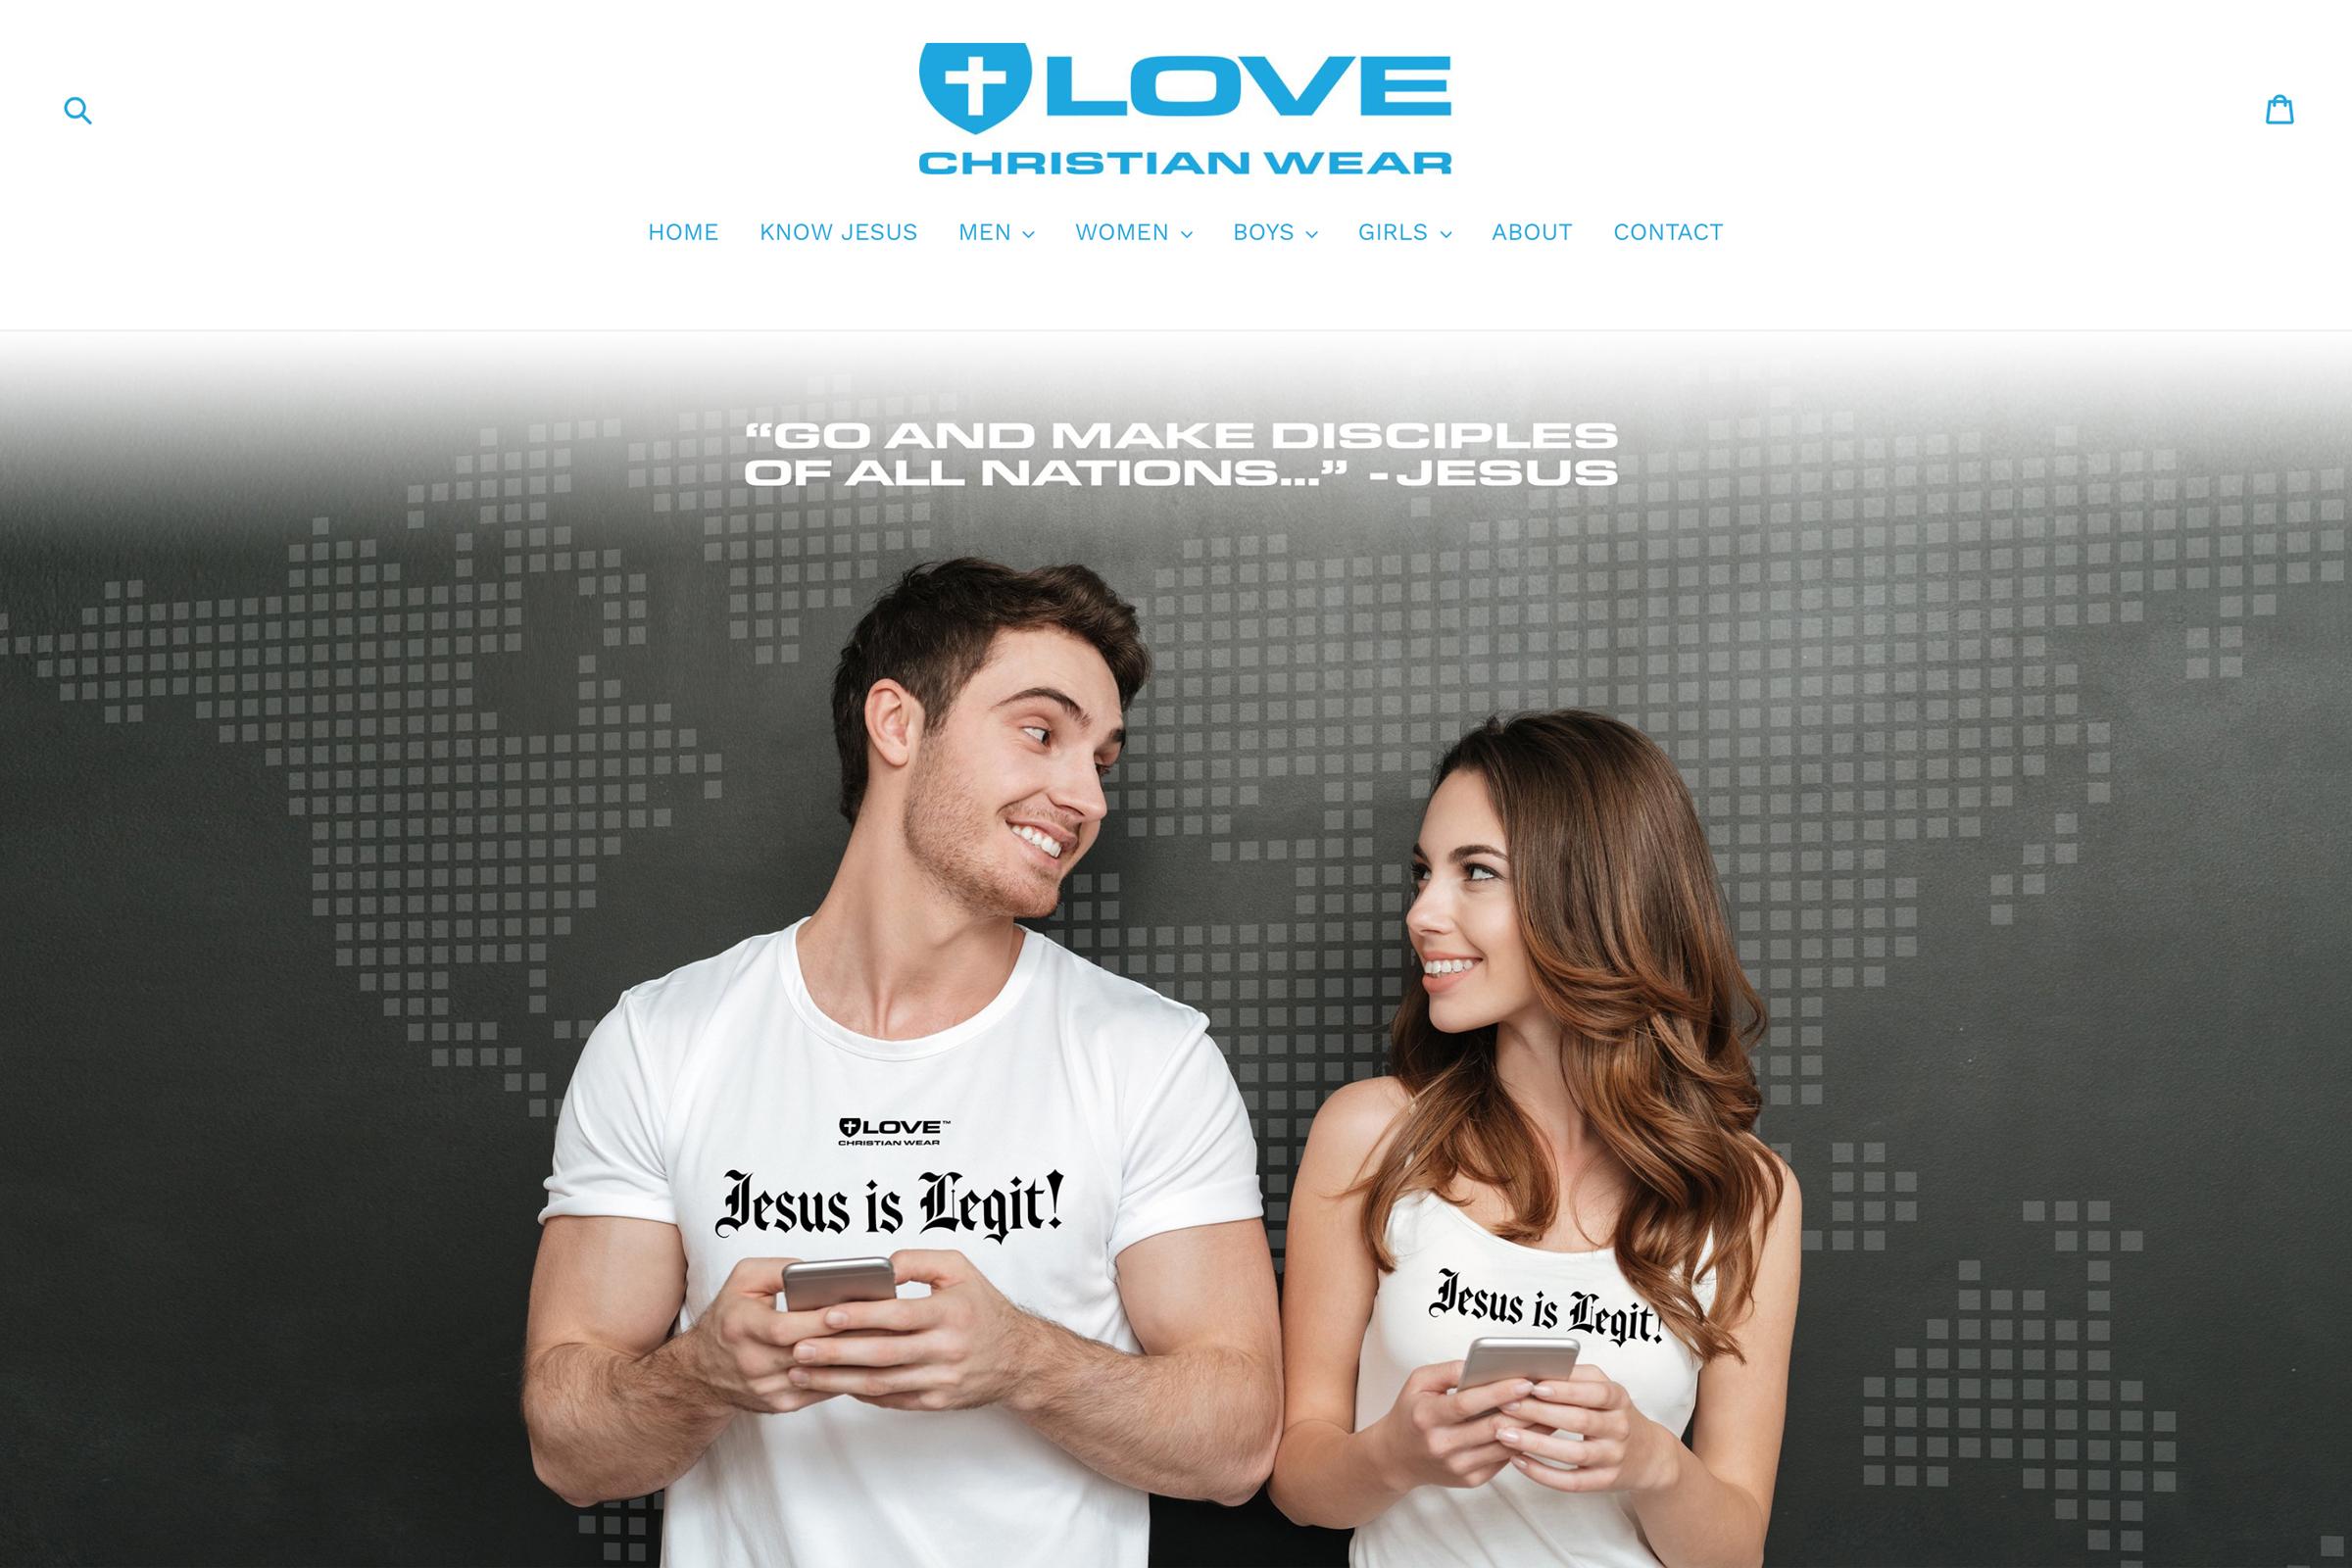 LoveChristianWearWebsite.jpg